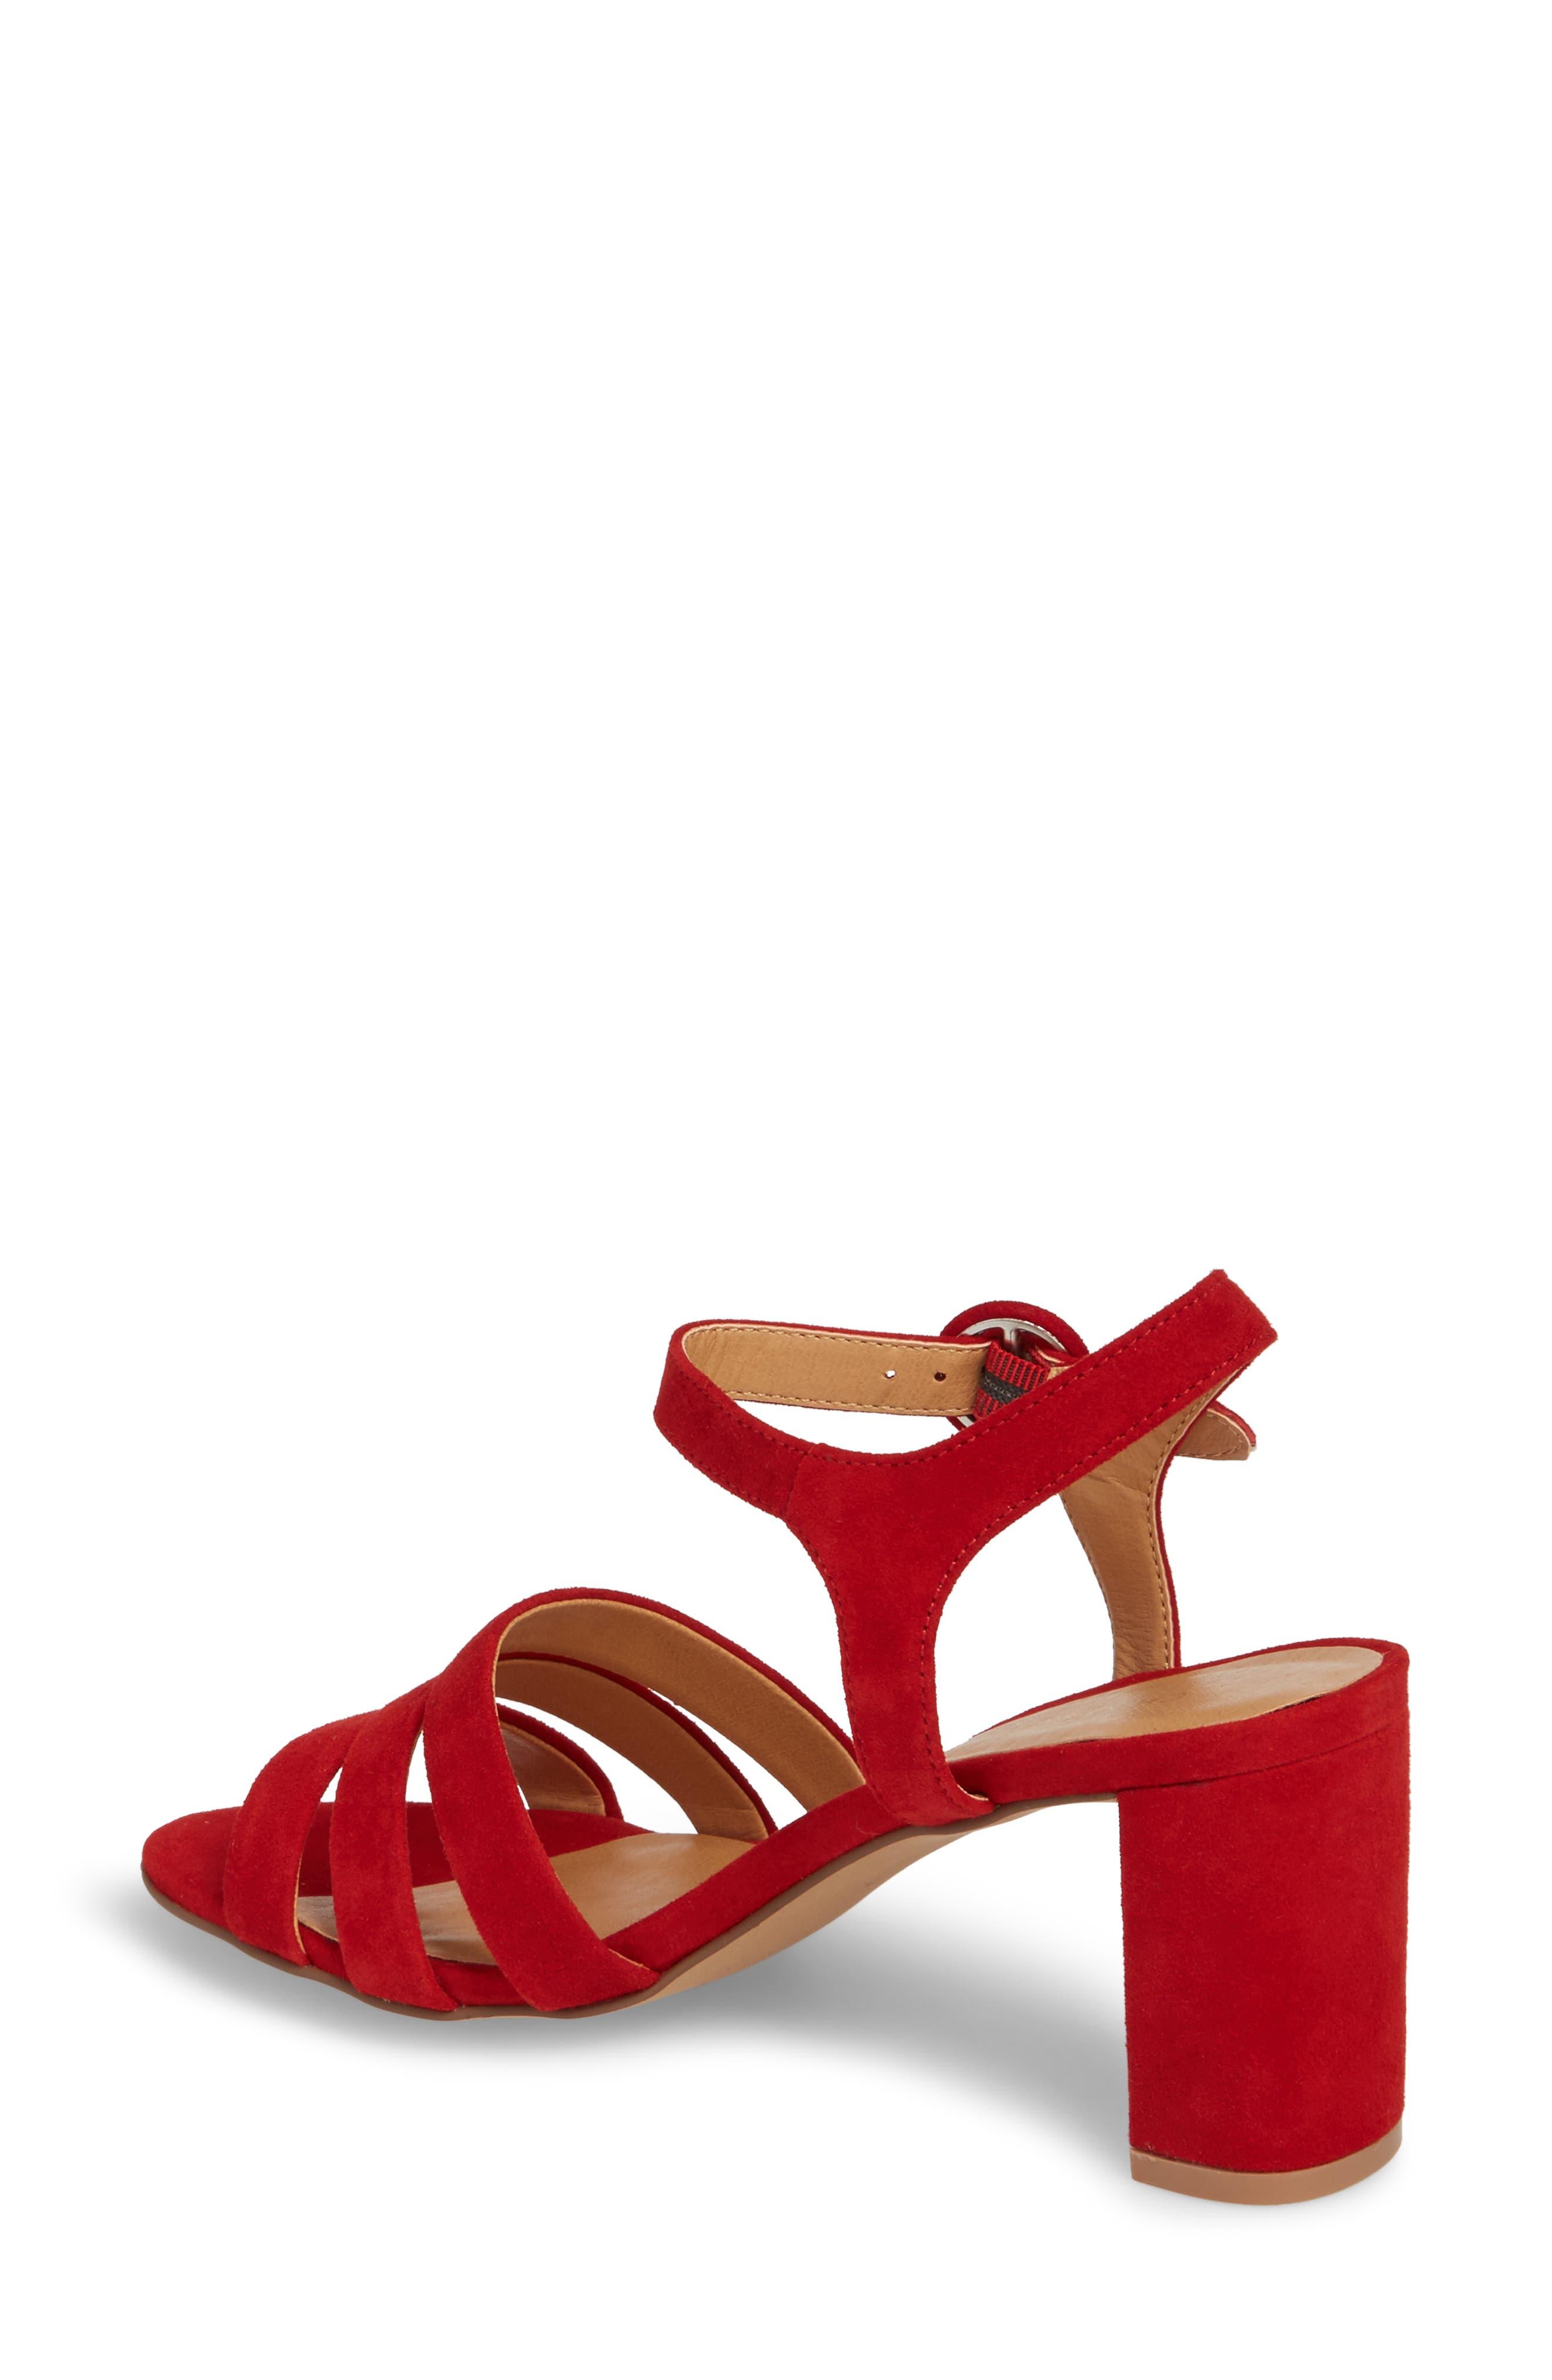 Ryden Strappy Sandal,                             Alternate thumbnail 2, color,                             Red